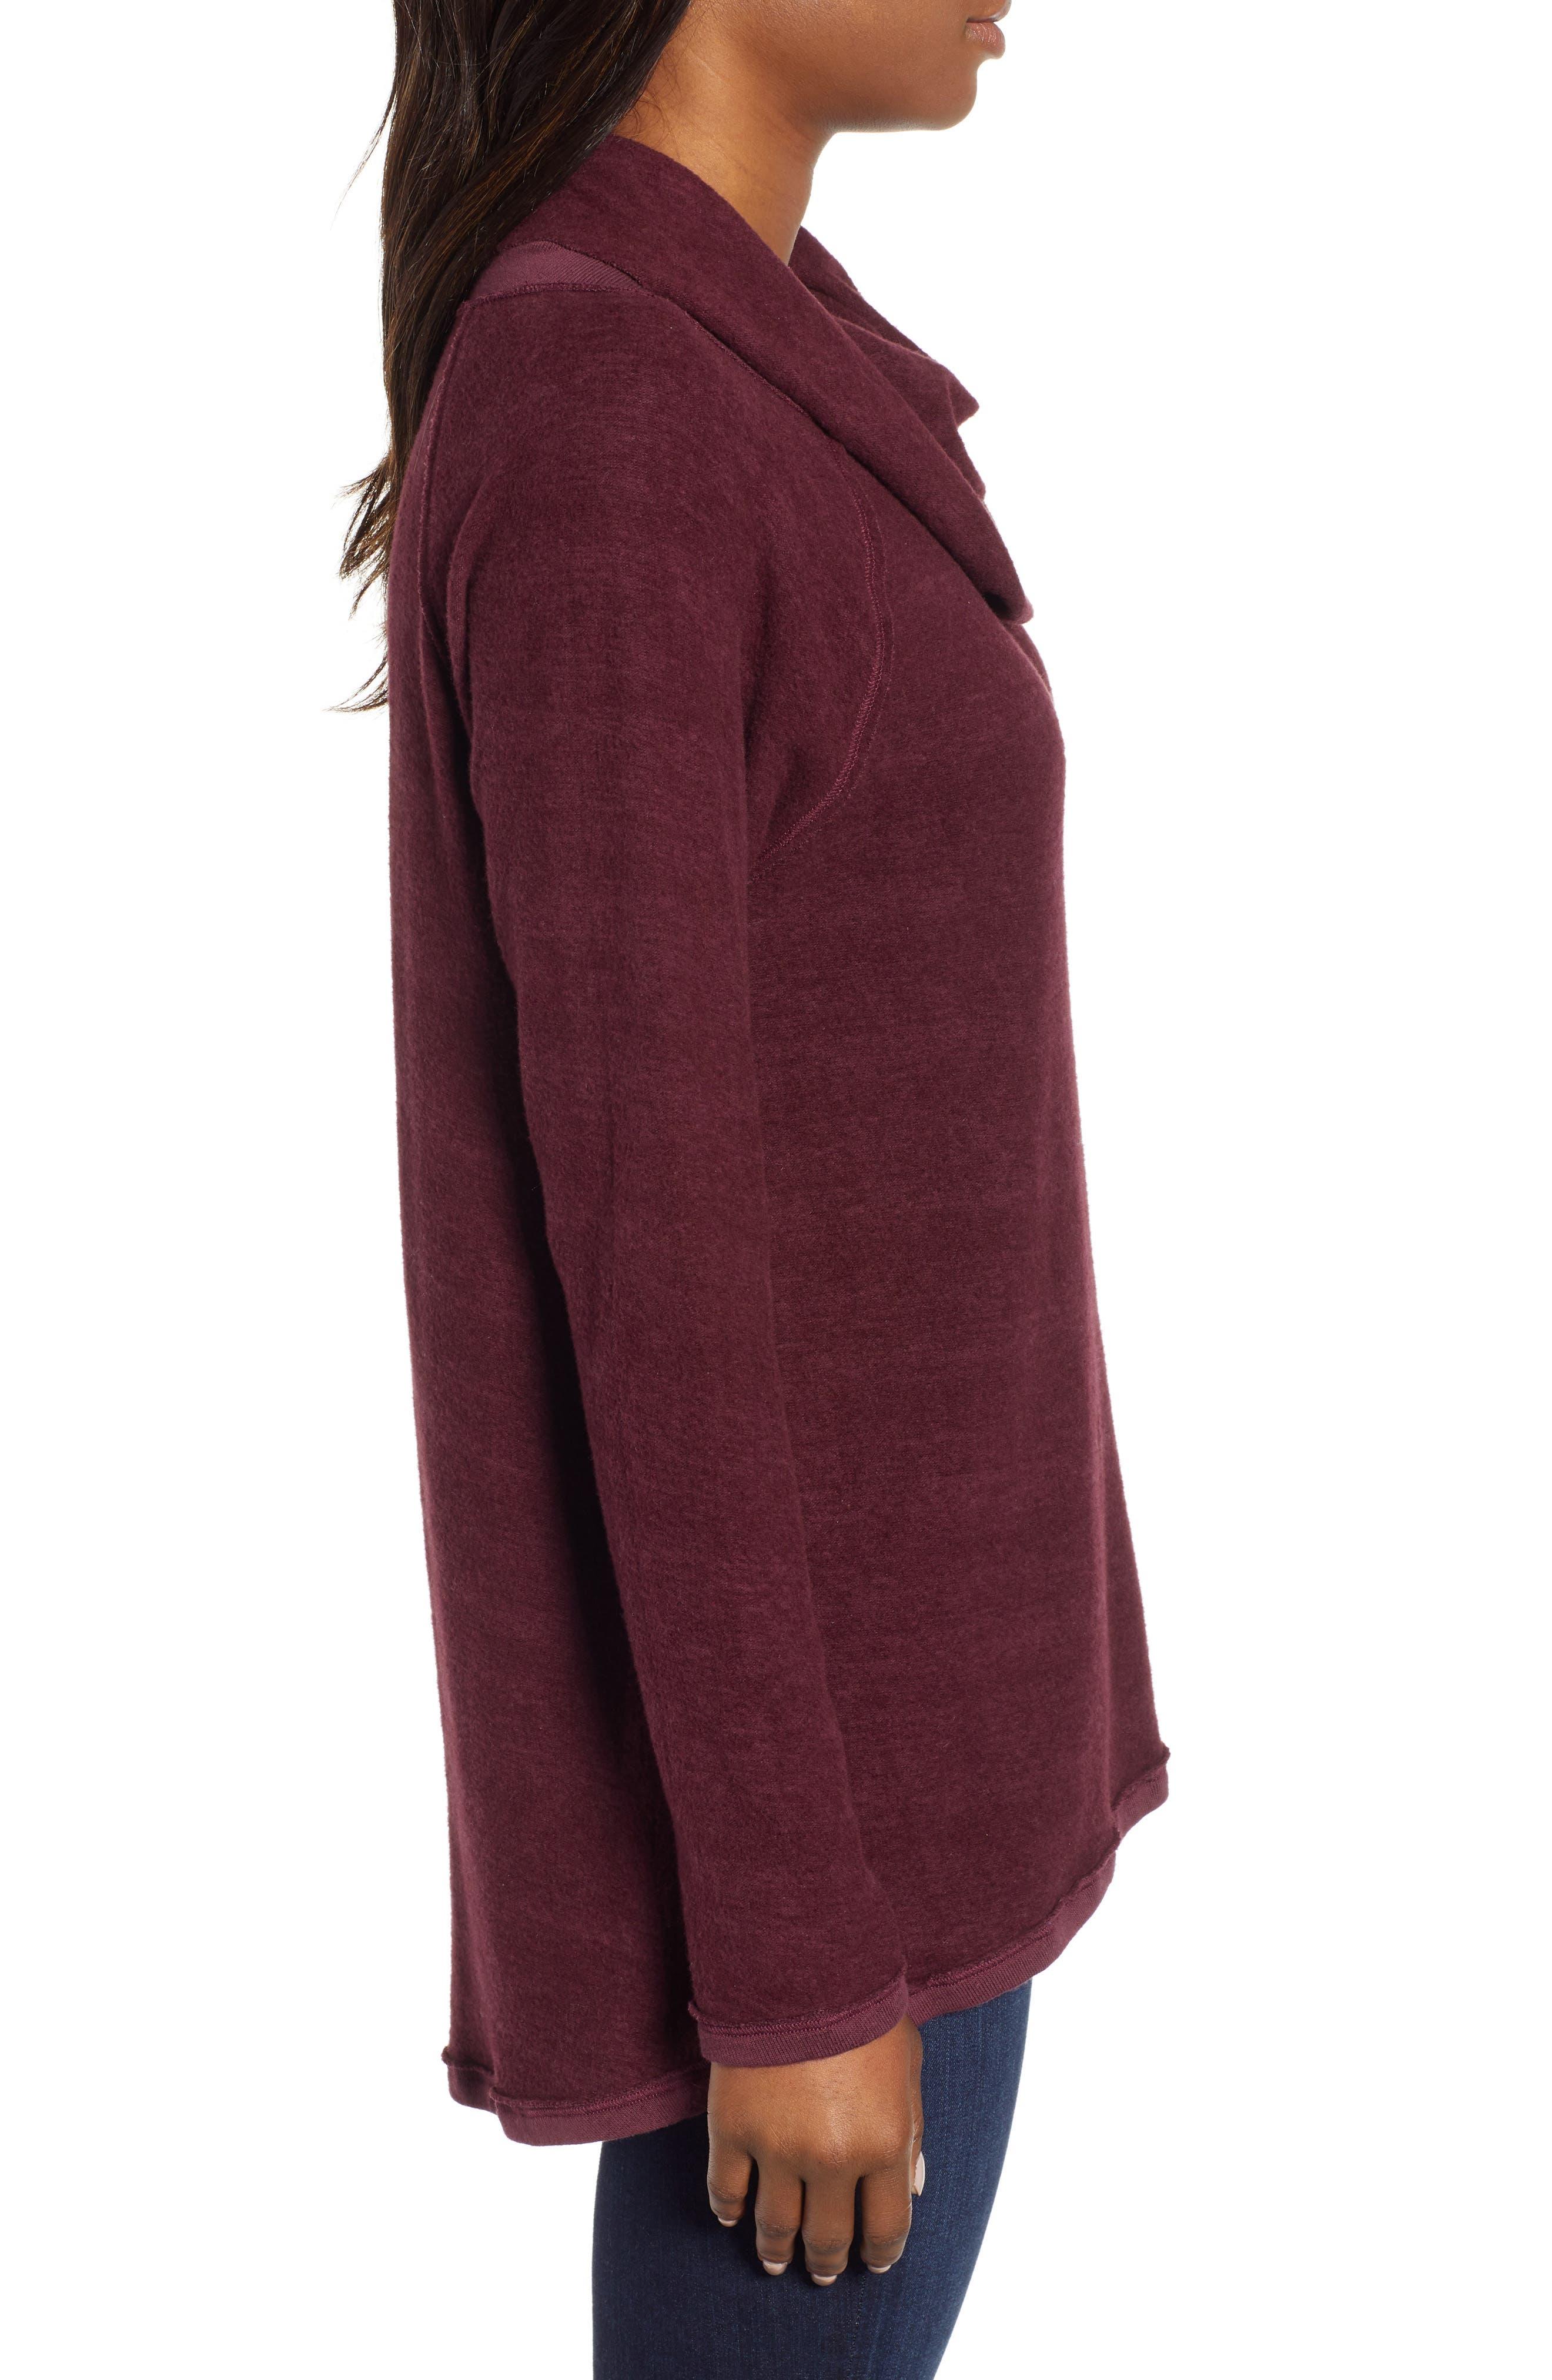 Knit Cowl Neck Tunic,                             Alternate thumbnail 3, color,                             930